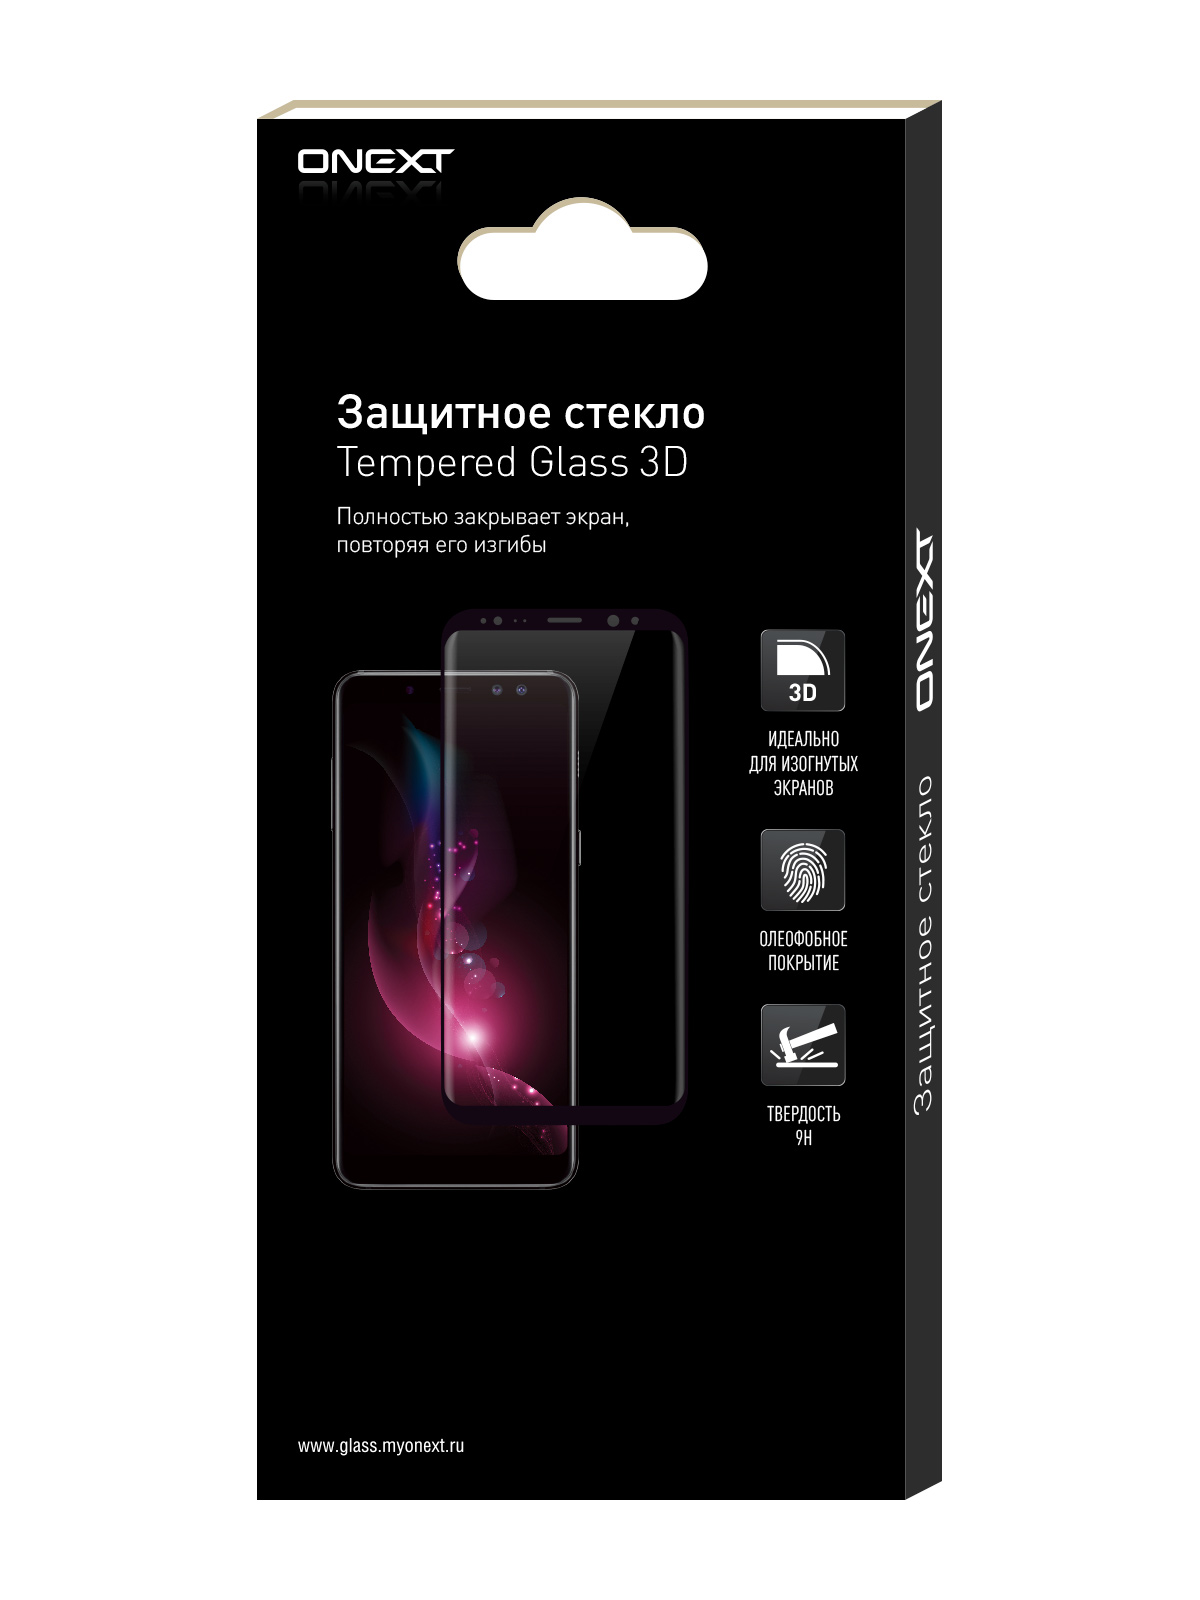 Защитное стекло ONEXT для Samsung Galaxy S6 Edge Plus Black